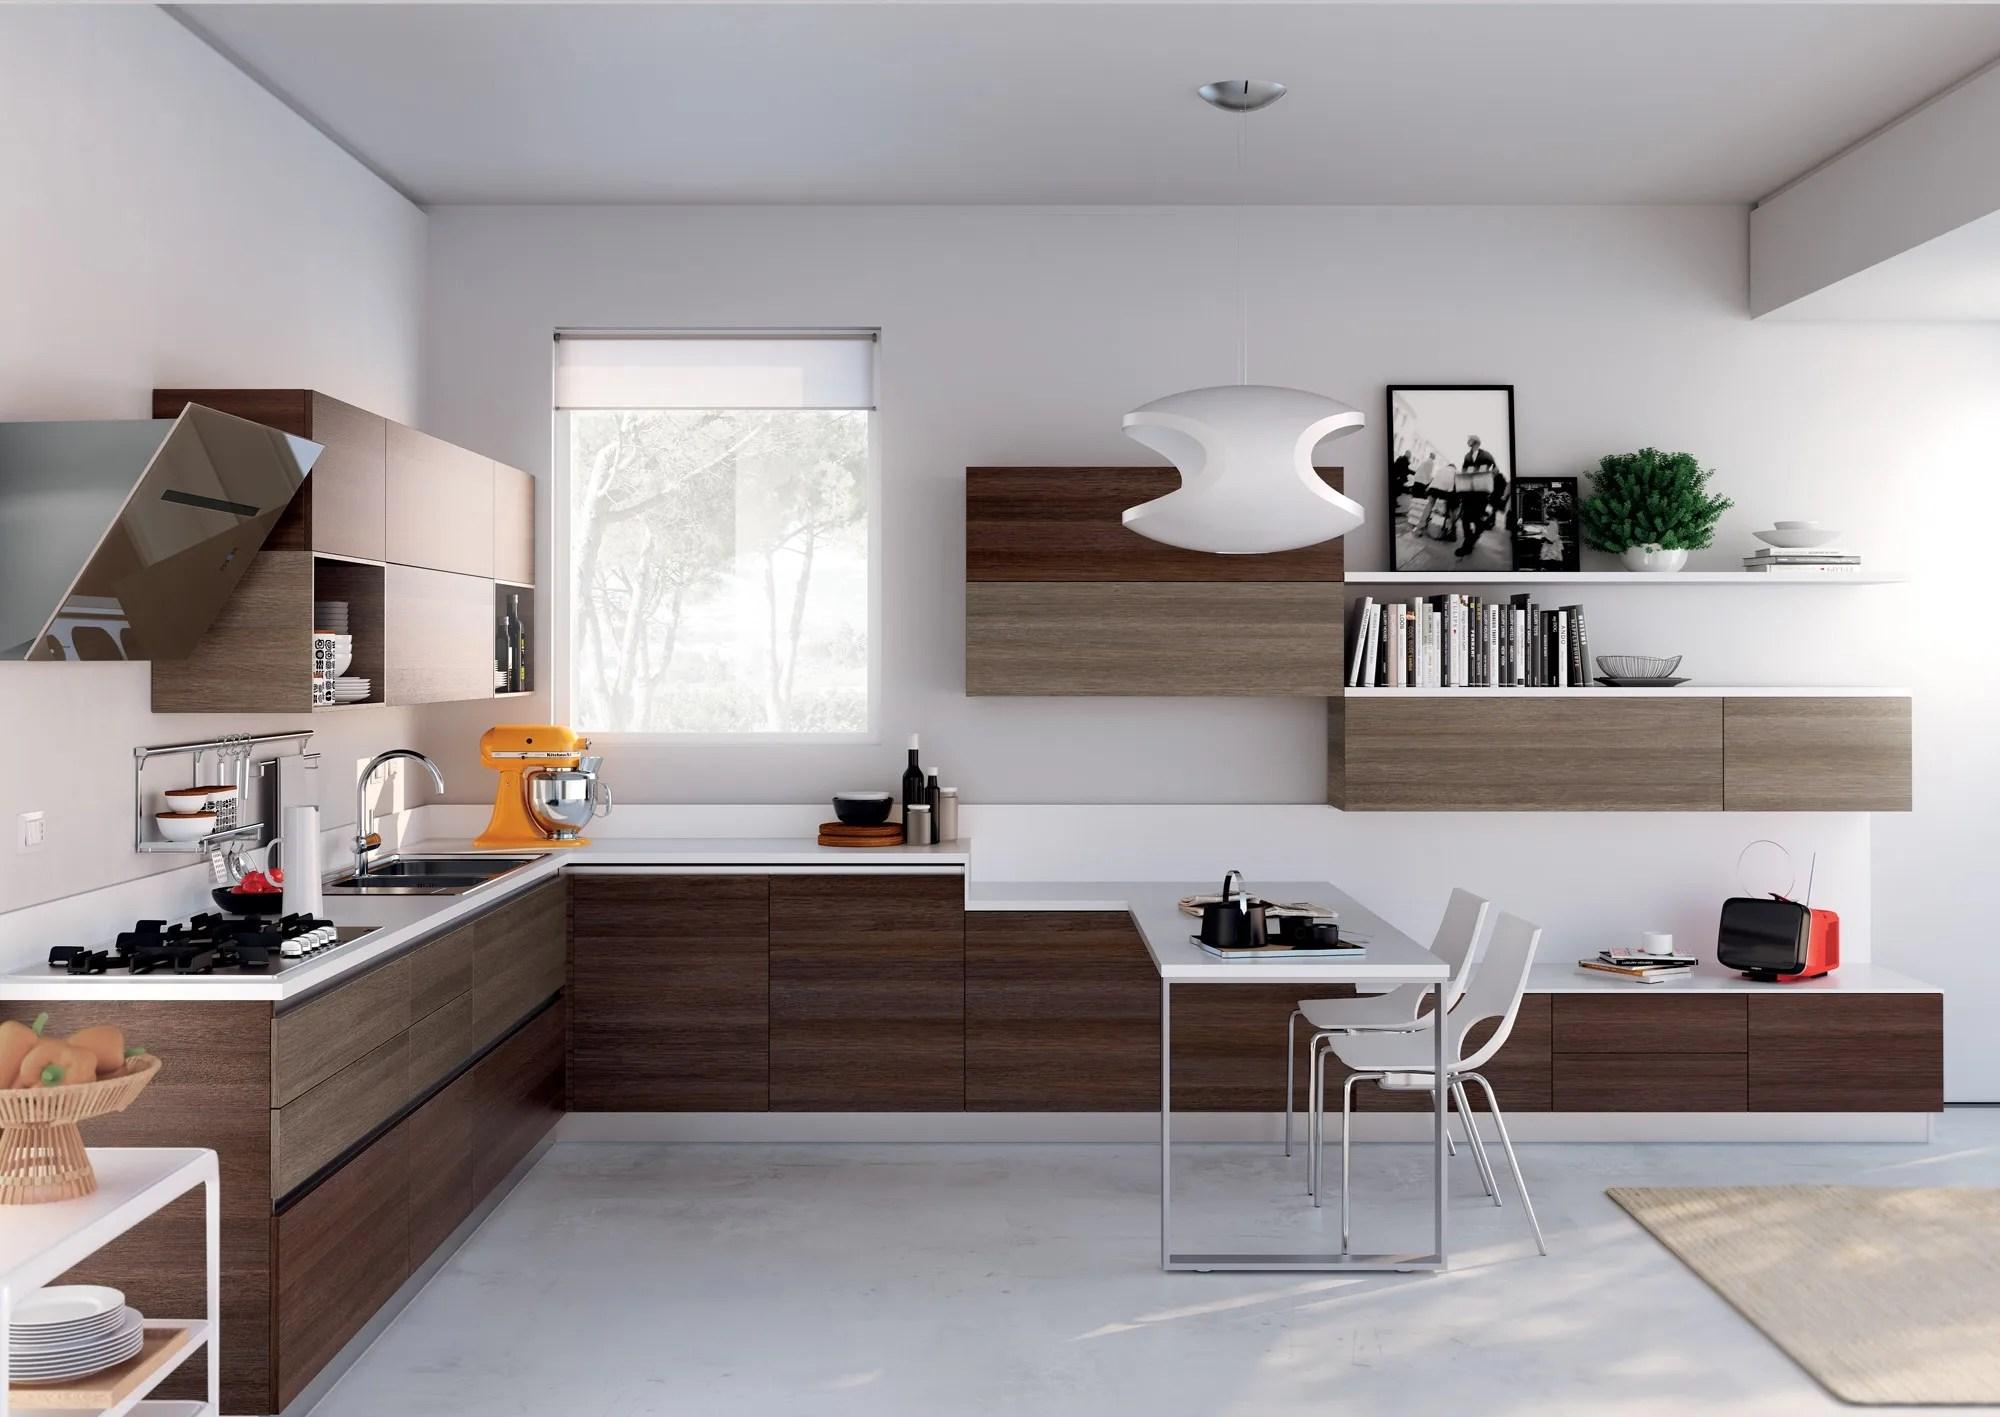 Cucina componibile EVOLUTION Linea Scavolini Basic By